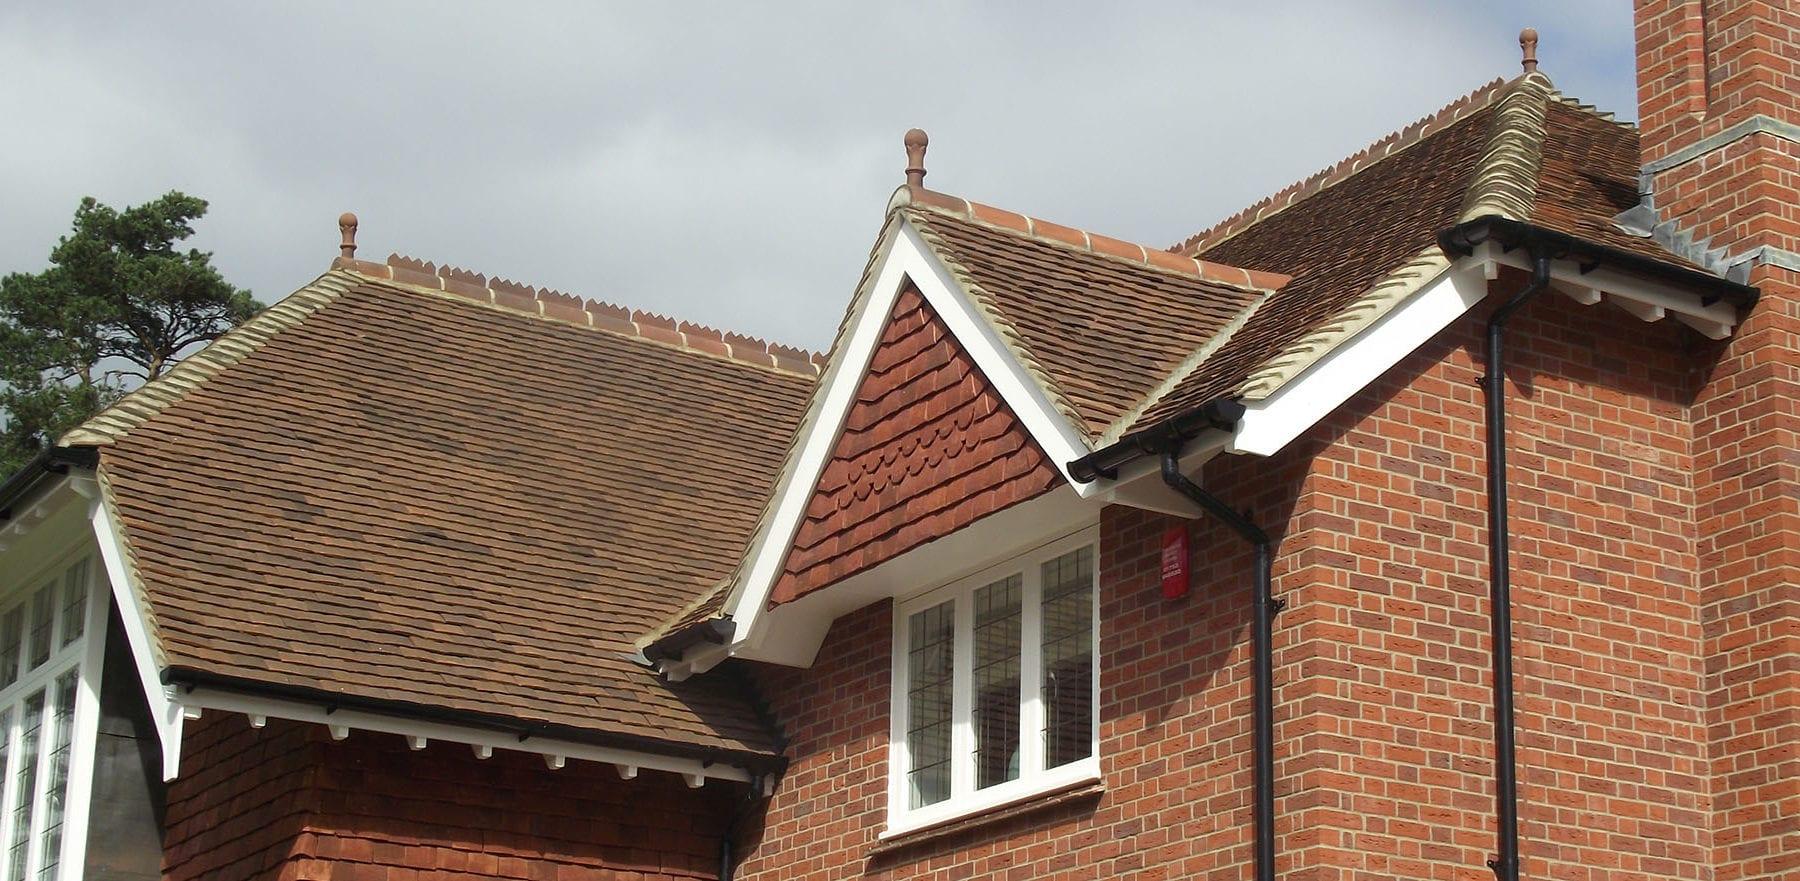 Lifestiles - Handmade Restoration Clay Roof Tiles - Cranleigh, England 3